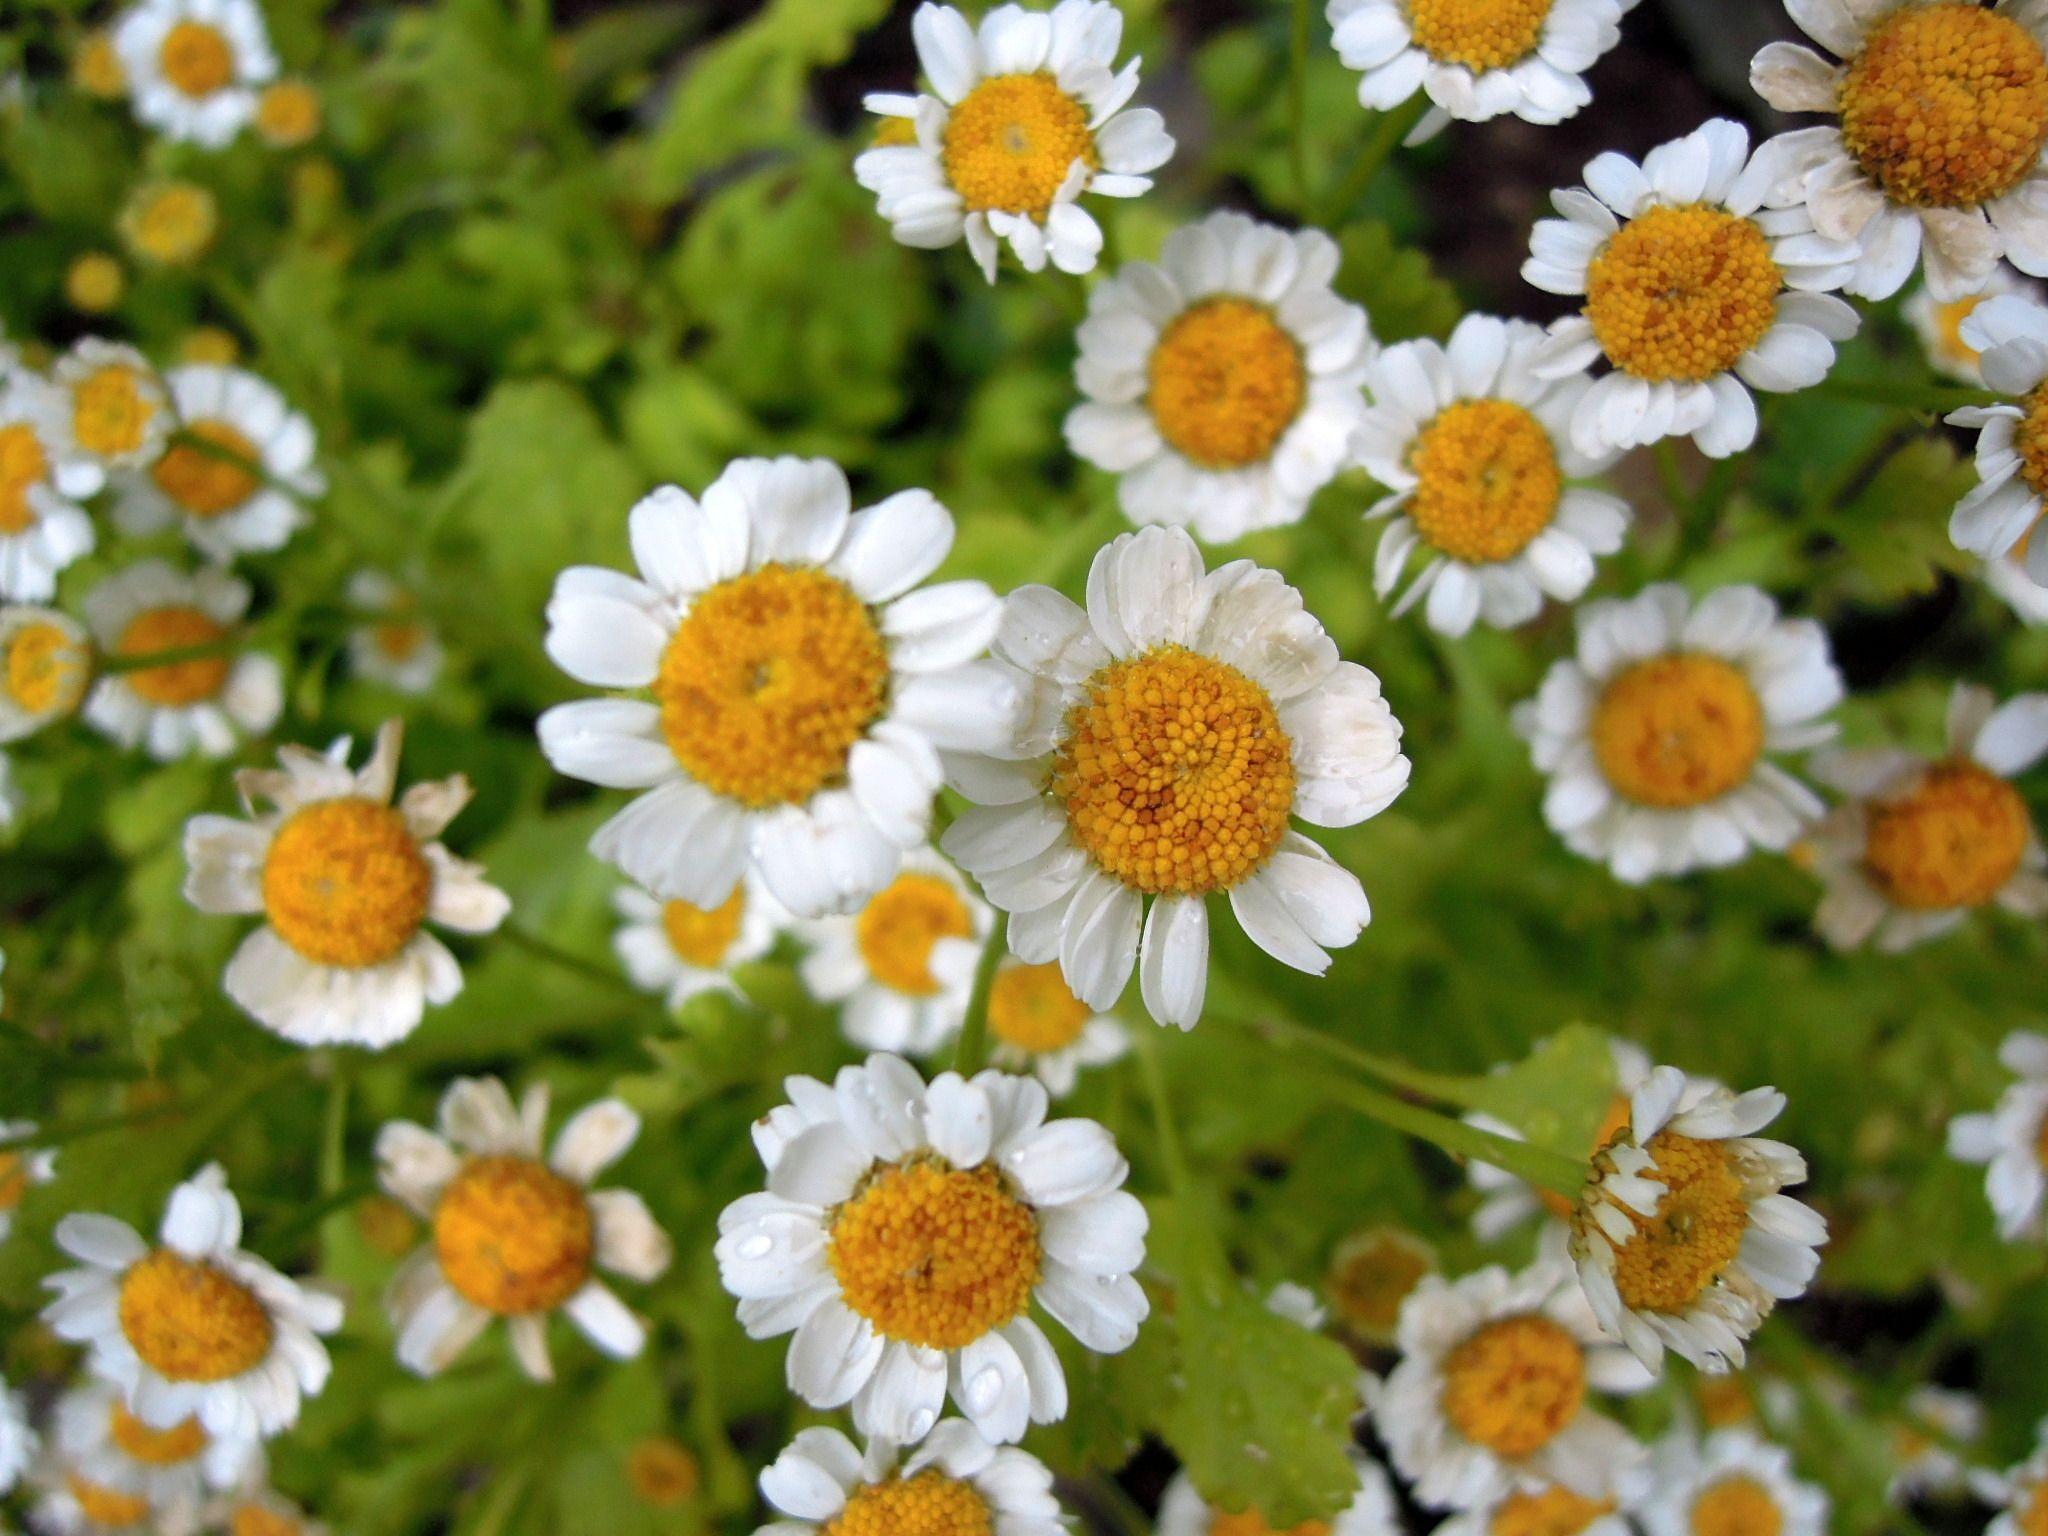 Explore Daisy And More